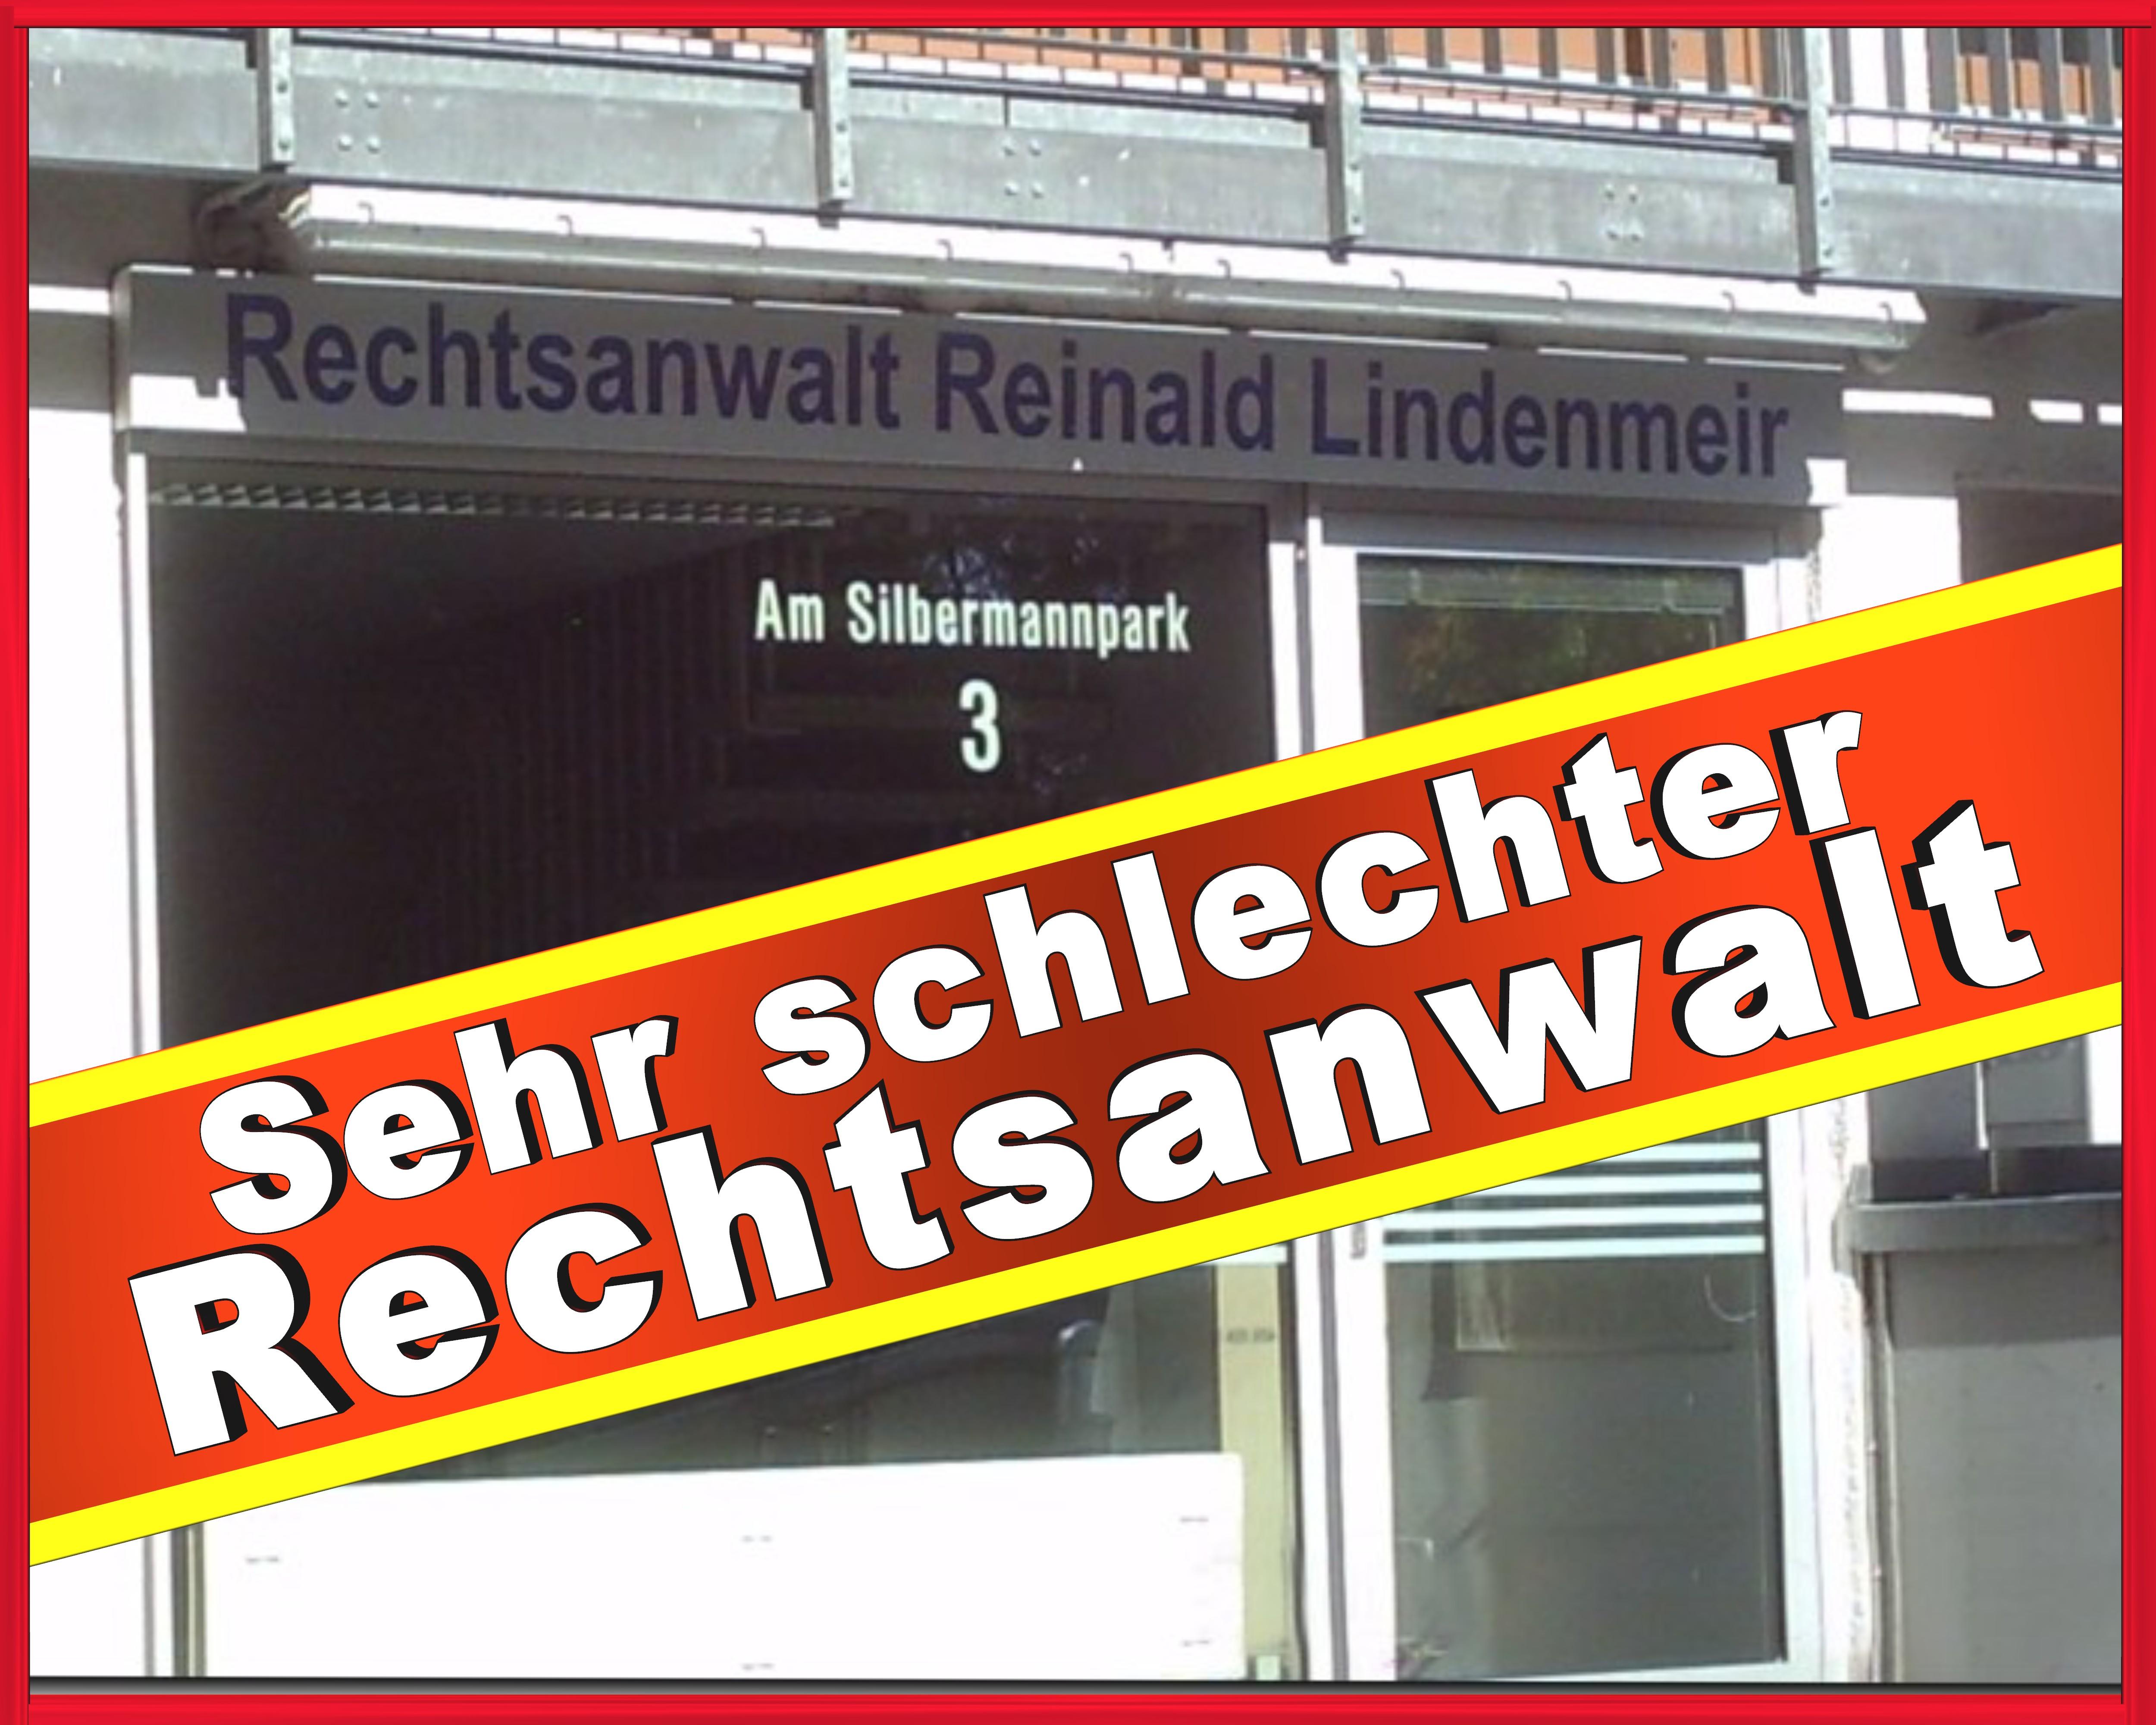 Rechtsanwalt Reinald Lindenmeir Augsburg